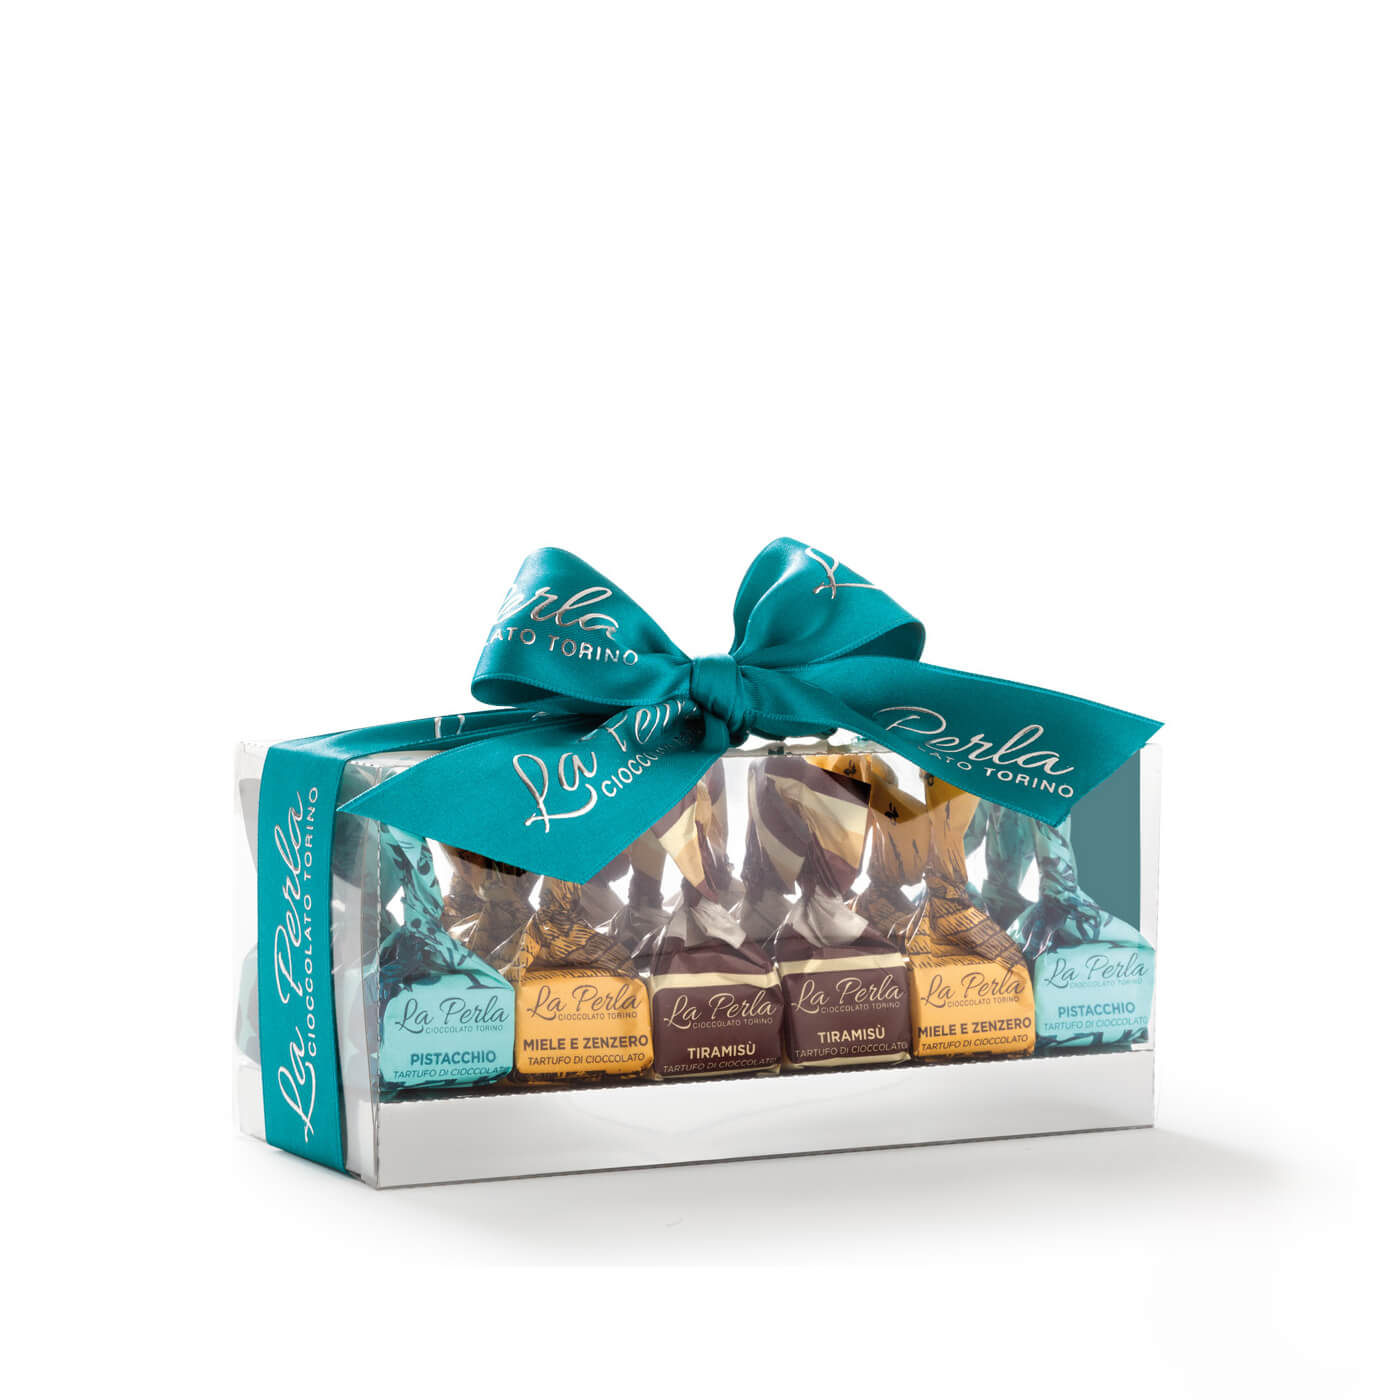 tartufi-cioccolato-la-perla-di-torino-68